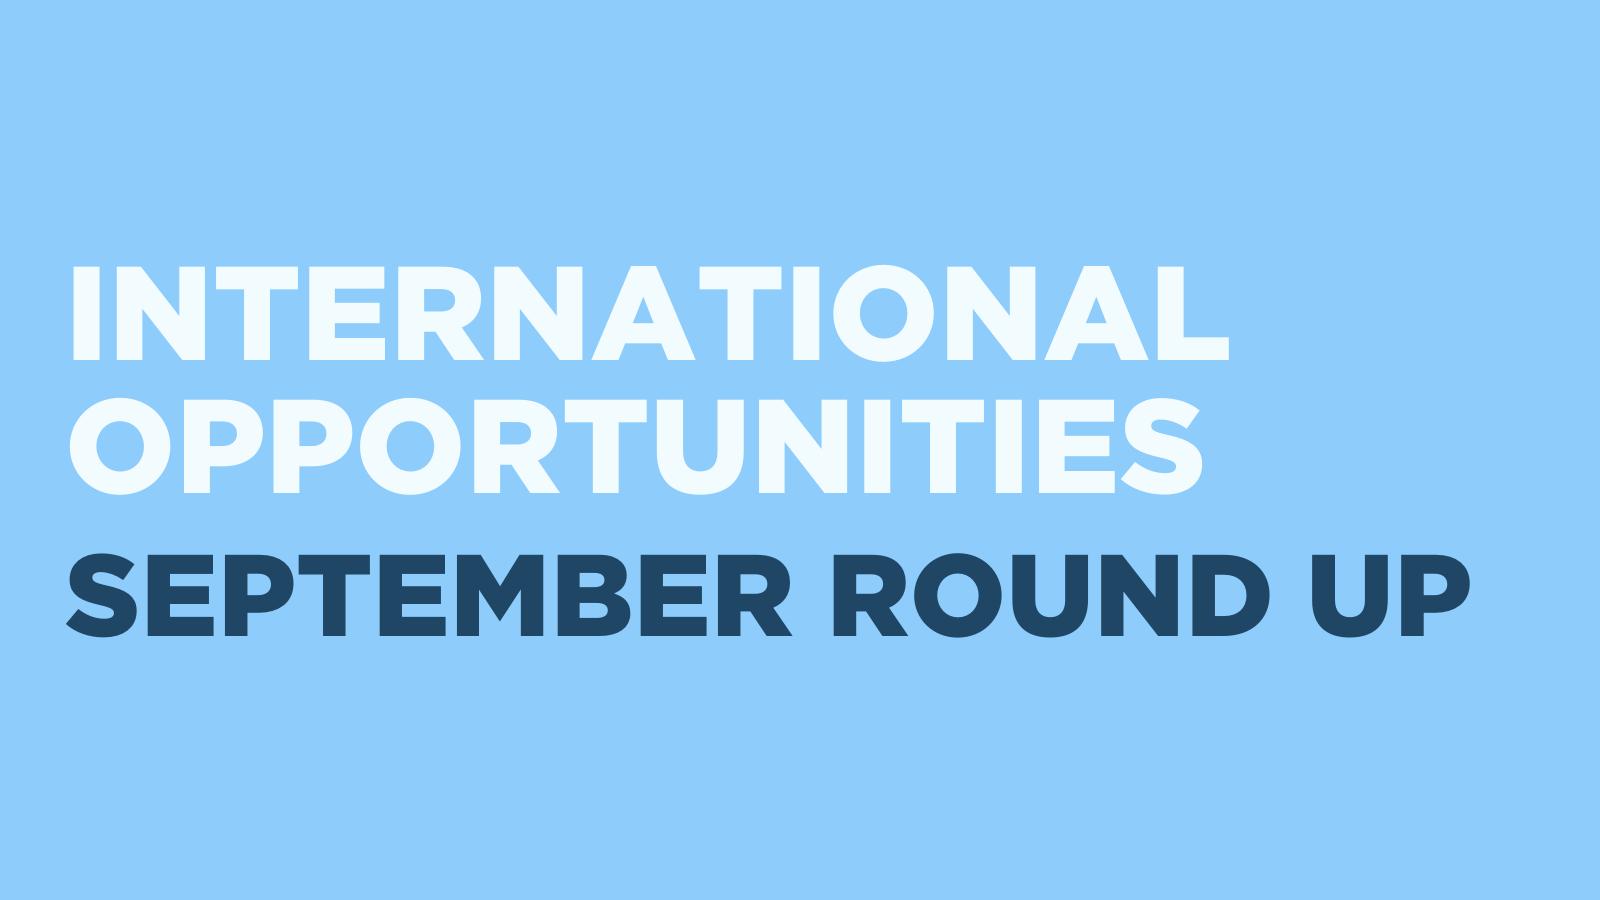 International Opportunities September Round Up